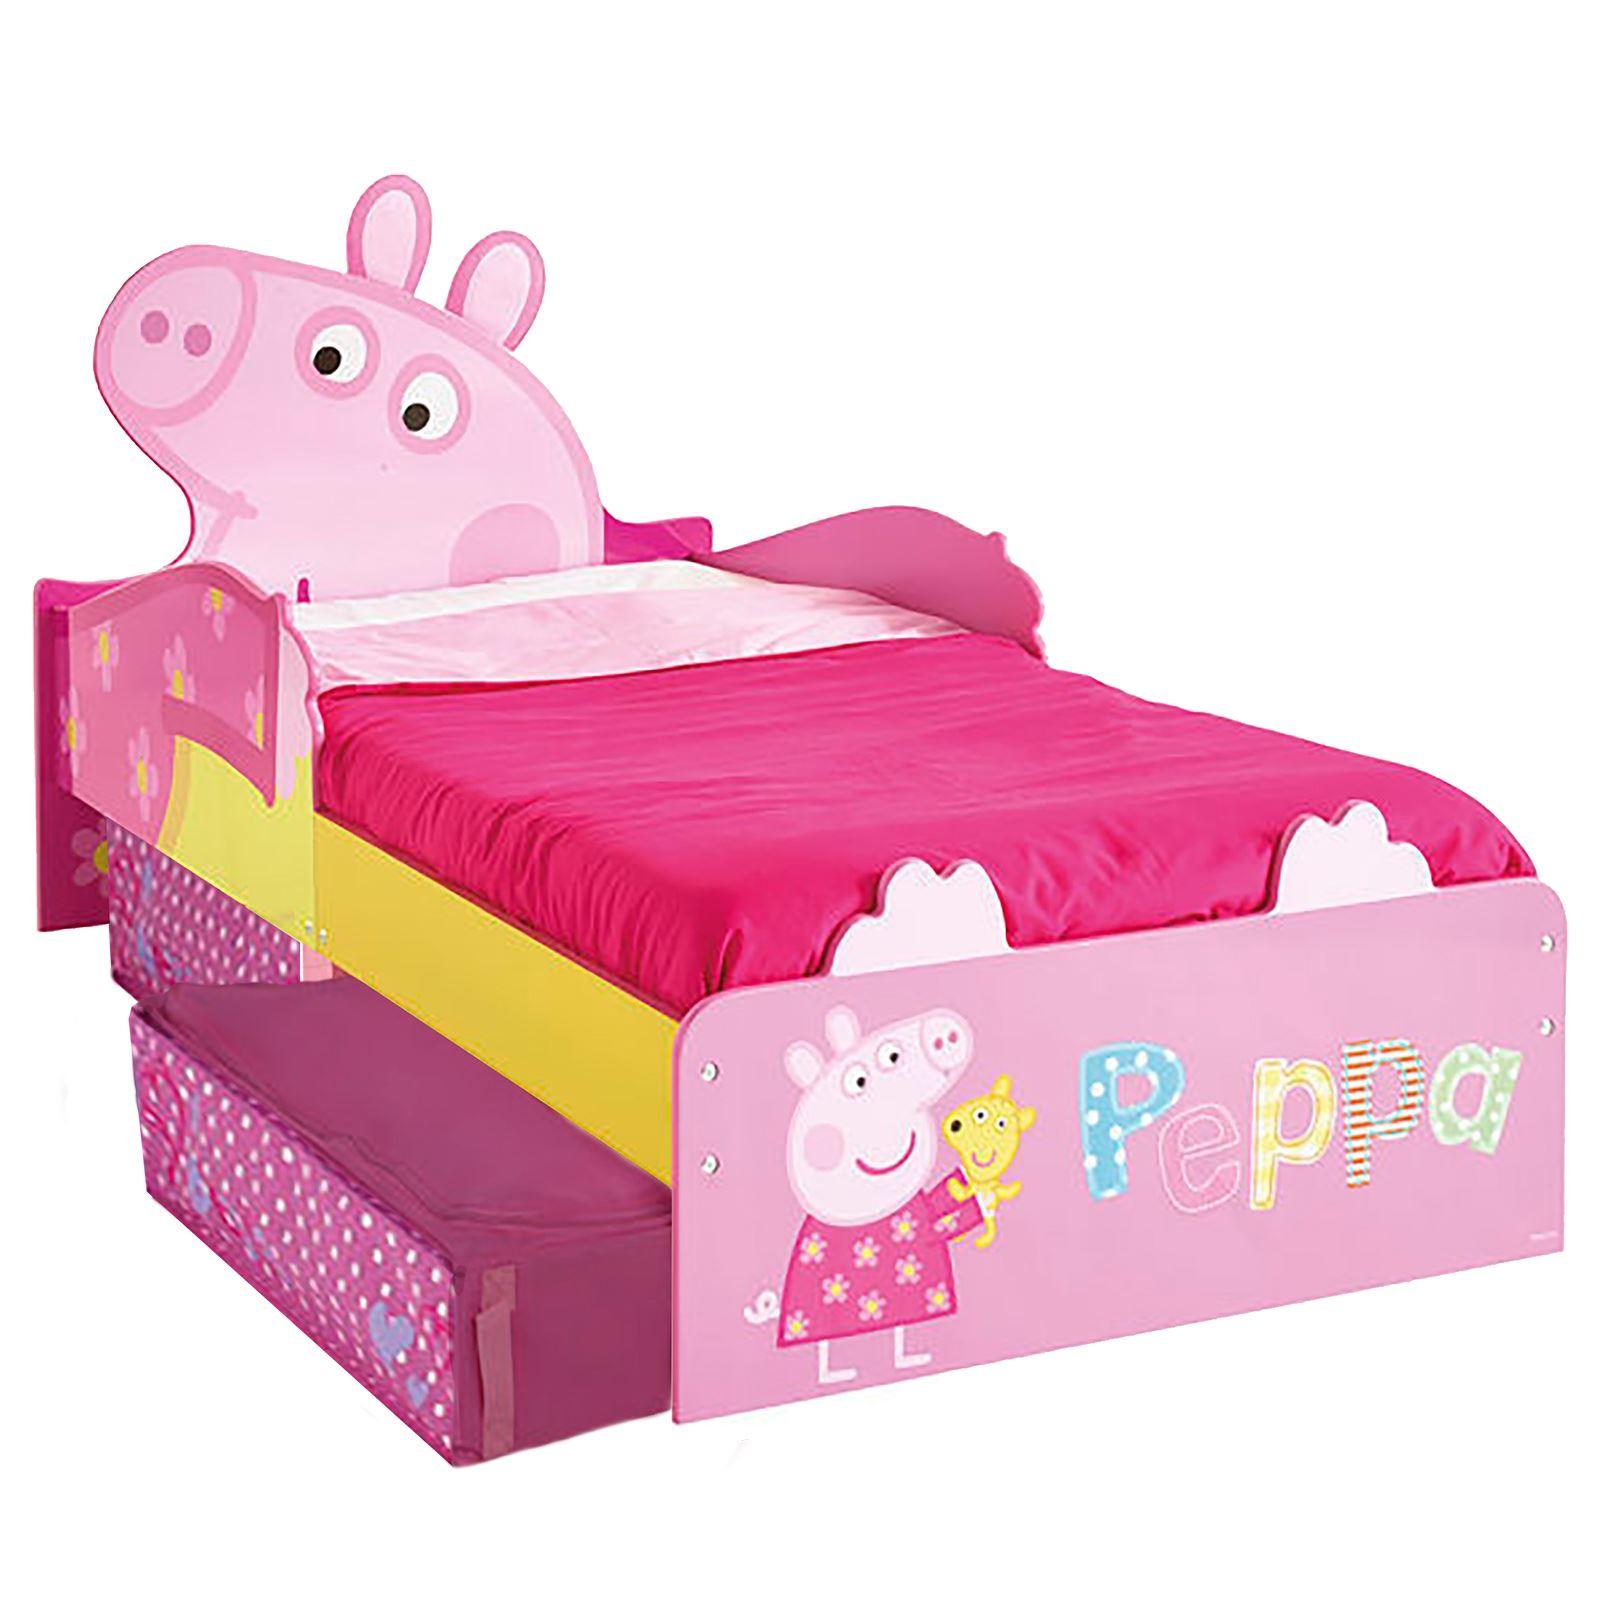 Disney lit enfant b b avec rangement matelas cars peppa minnie ebay - Lit bebe disney ...